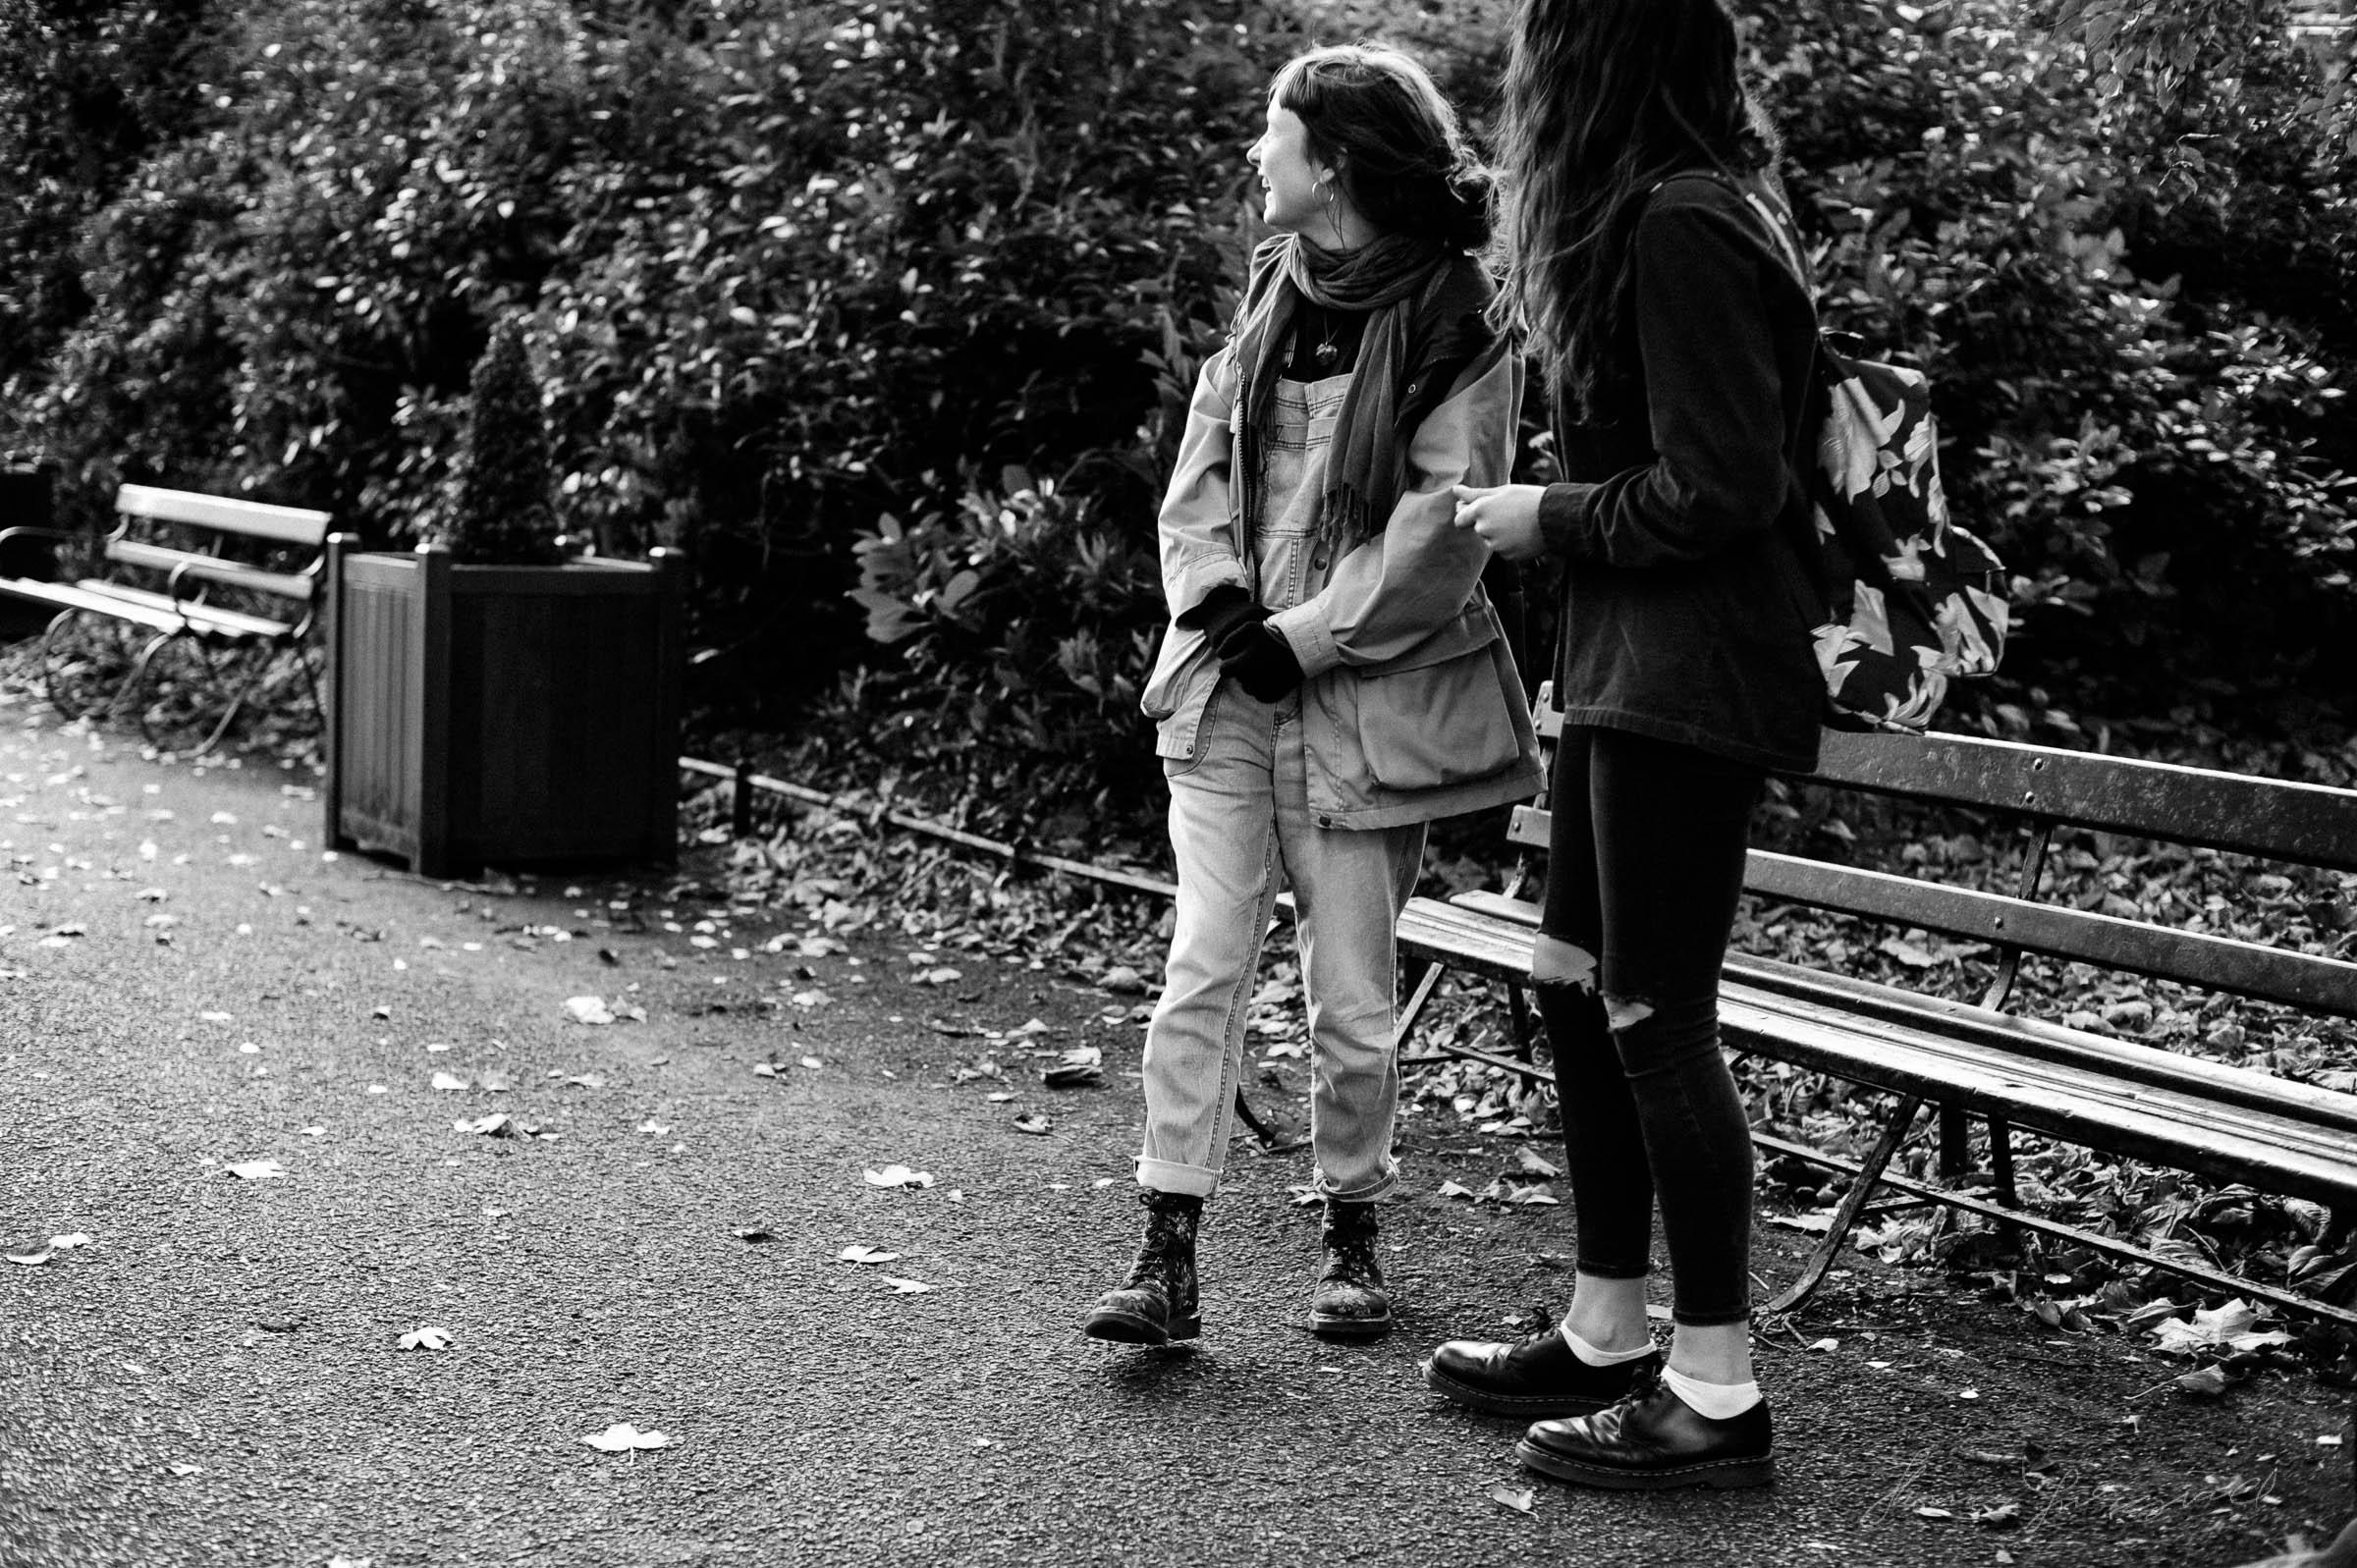 Street-photo-diary-eleven-67.jpg